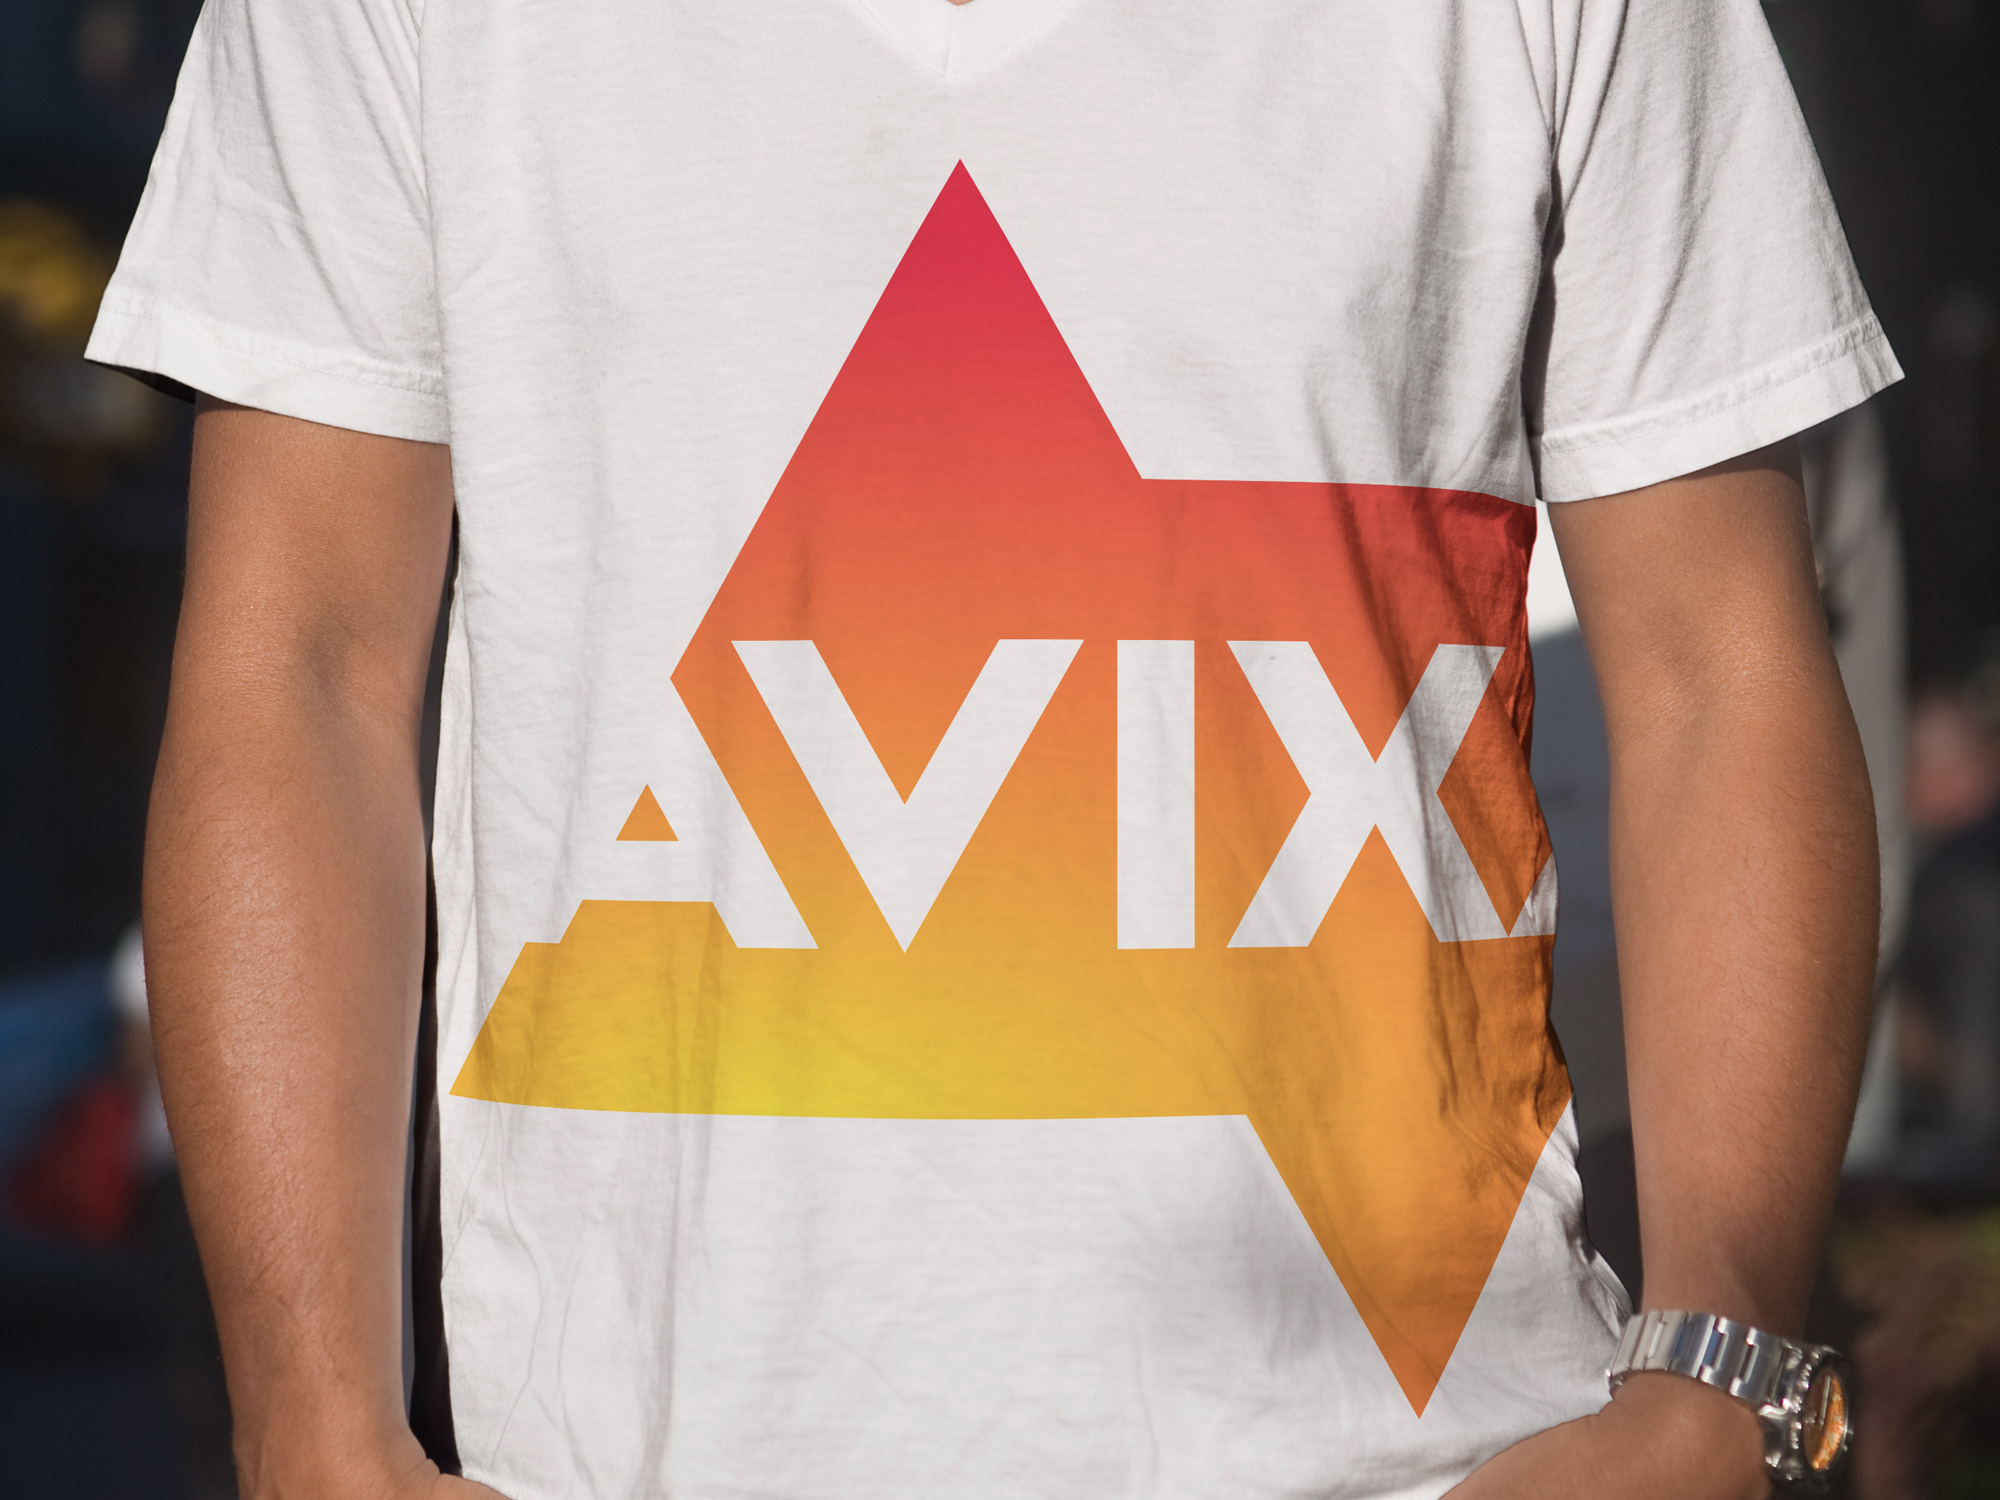 avixa-application-swag-shirt.jpg